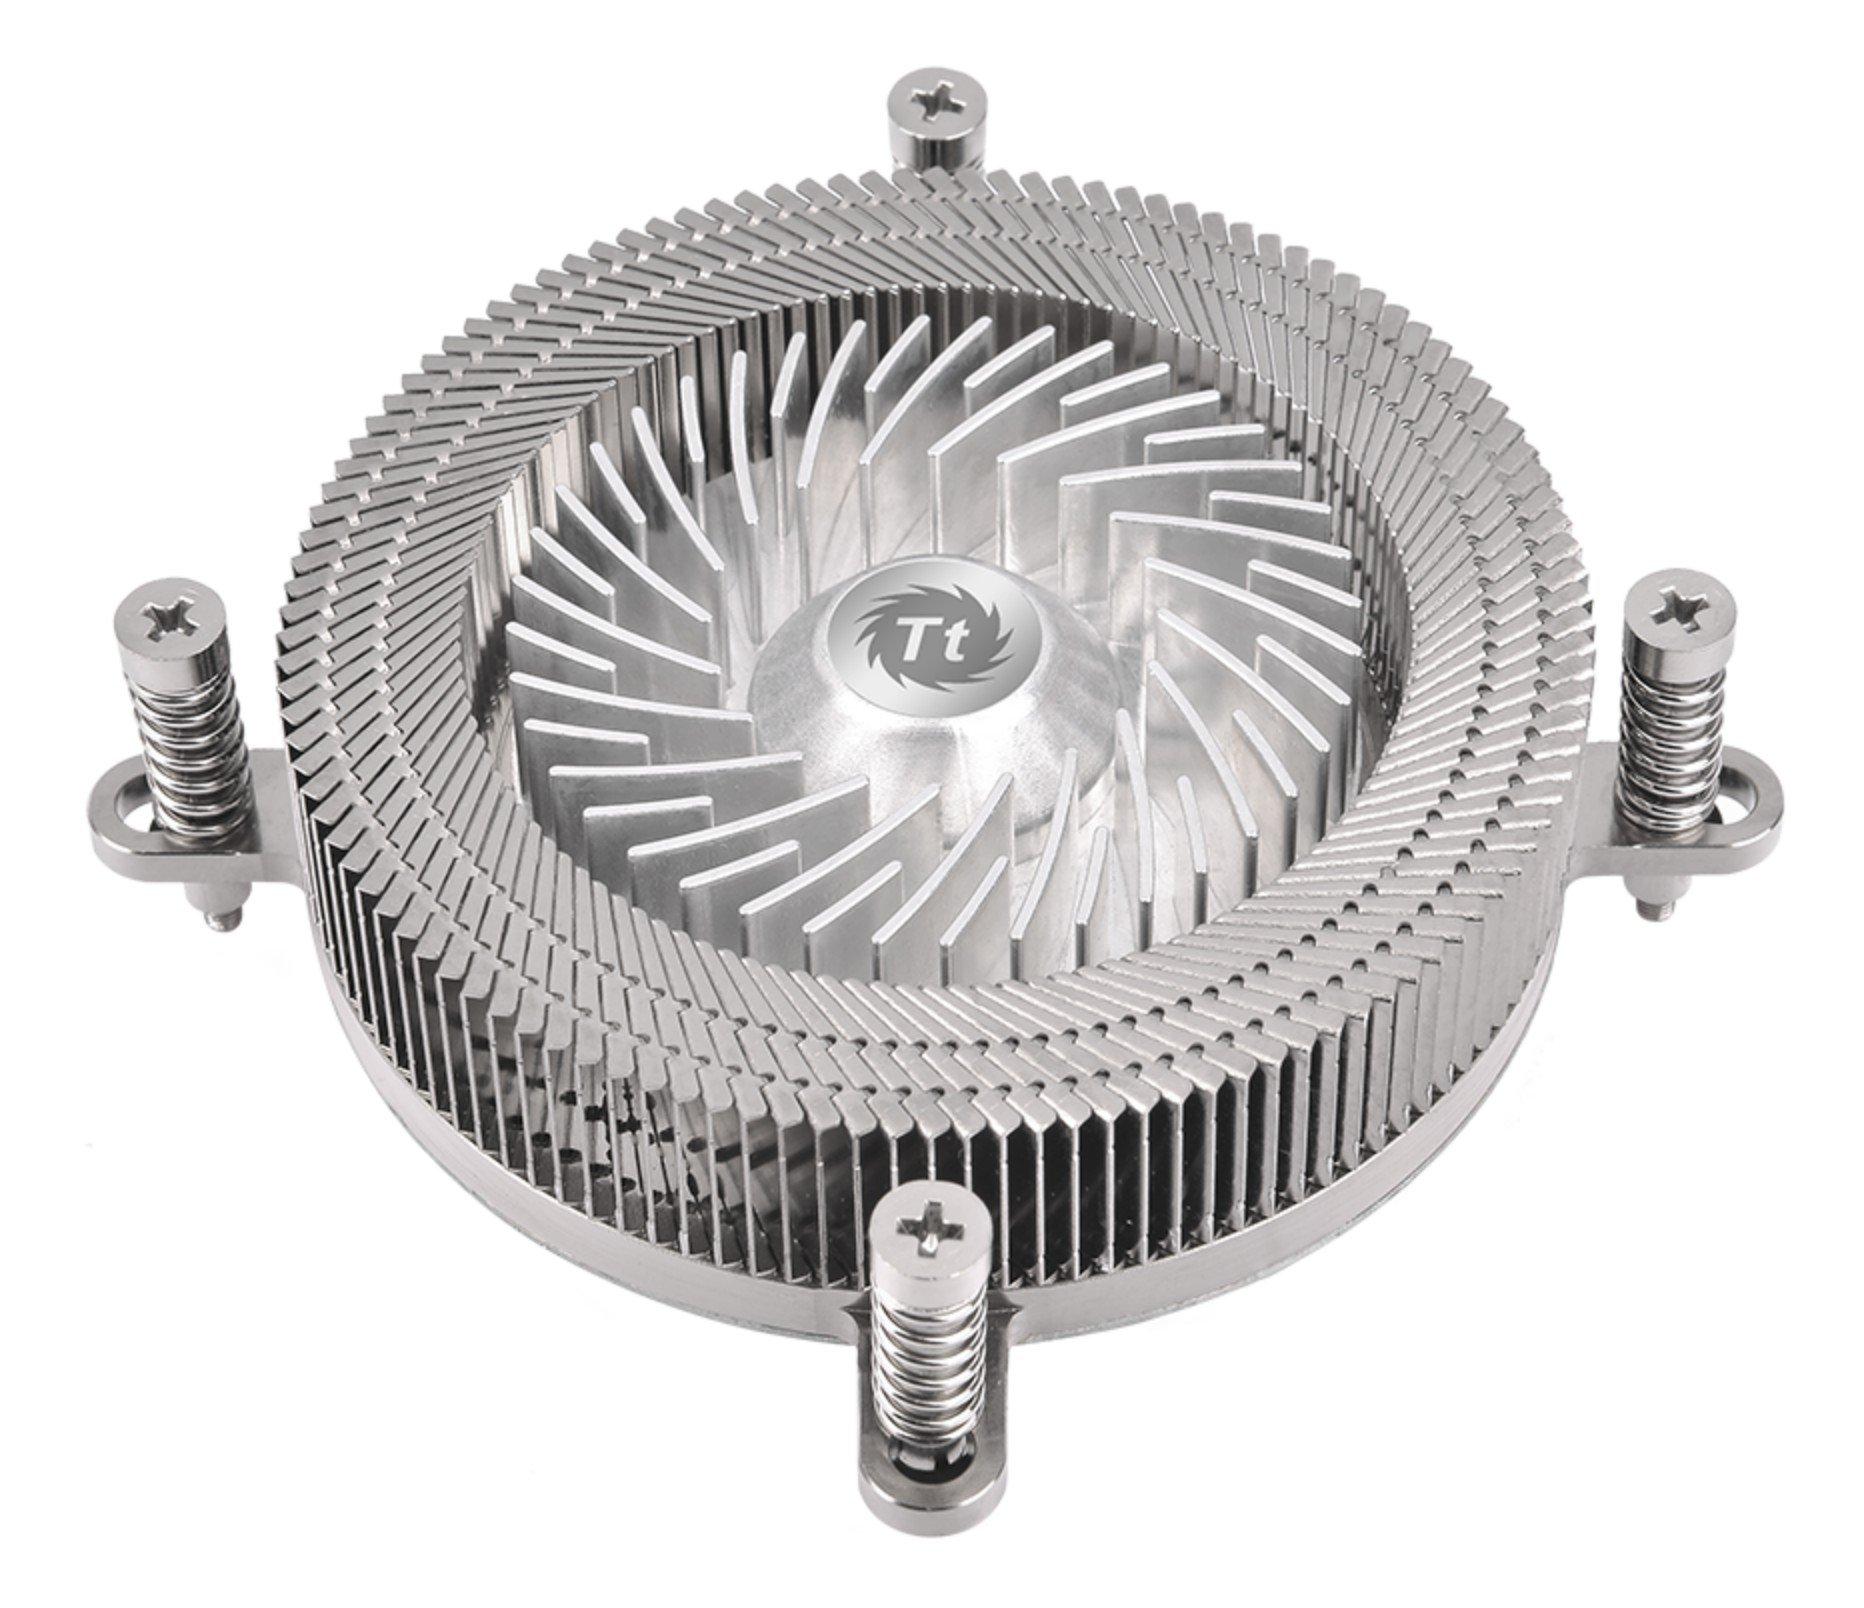 Thermaltake Engine 27 1U Low-Profile 70W Intel 60mm Low Noise PWM Fan Forty Fan Blade CPU Cooler CL-P032-CA06SL-A